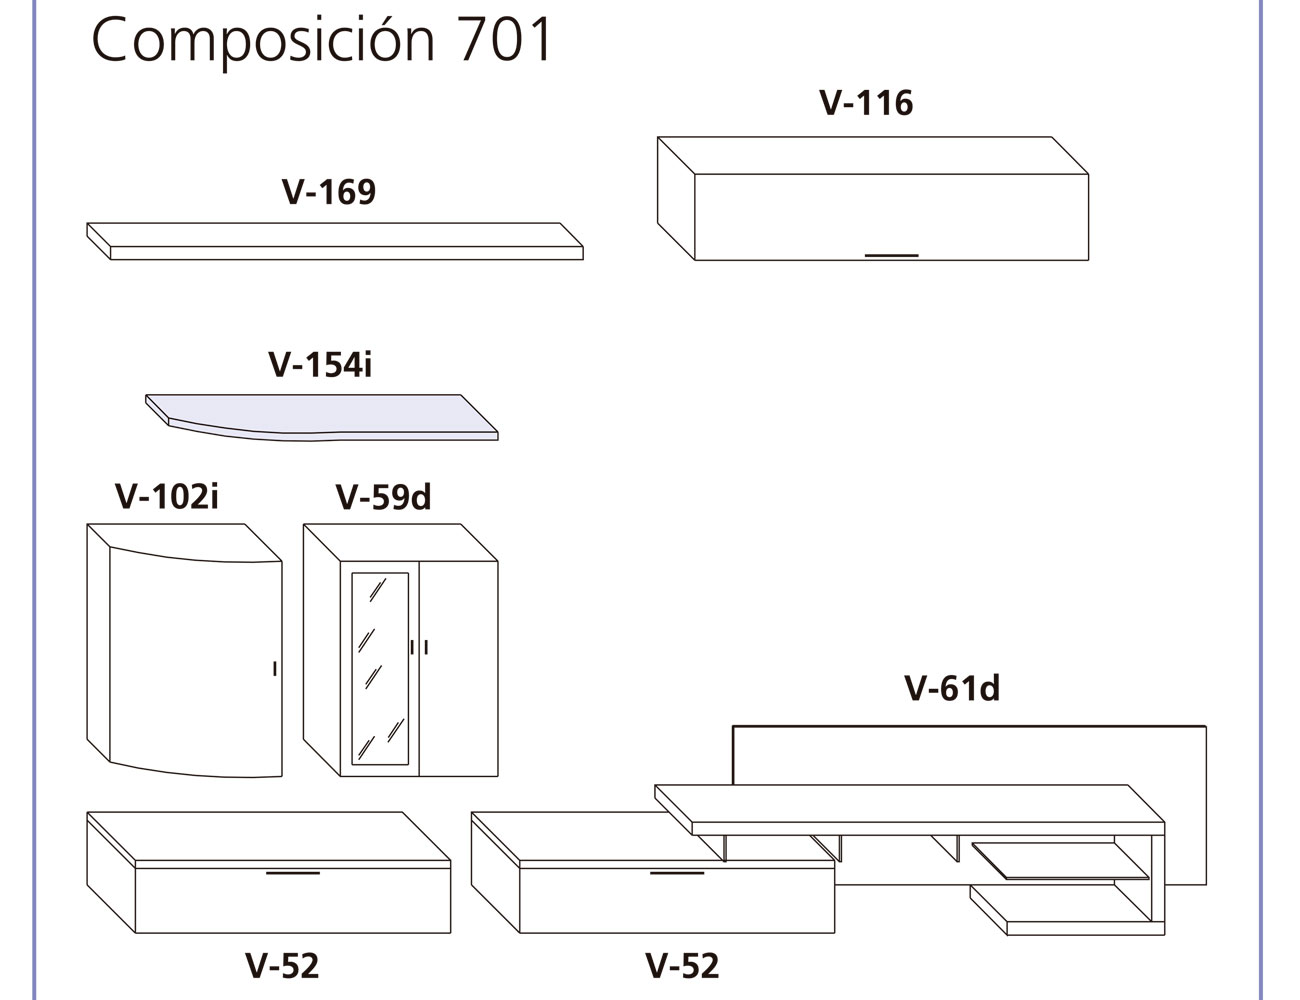 Composicion 701